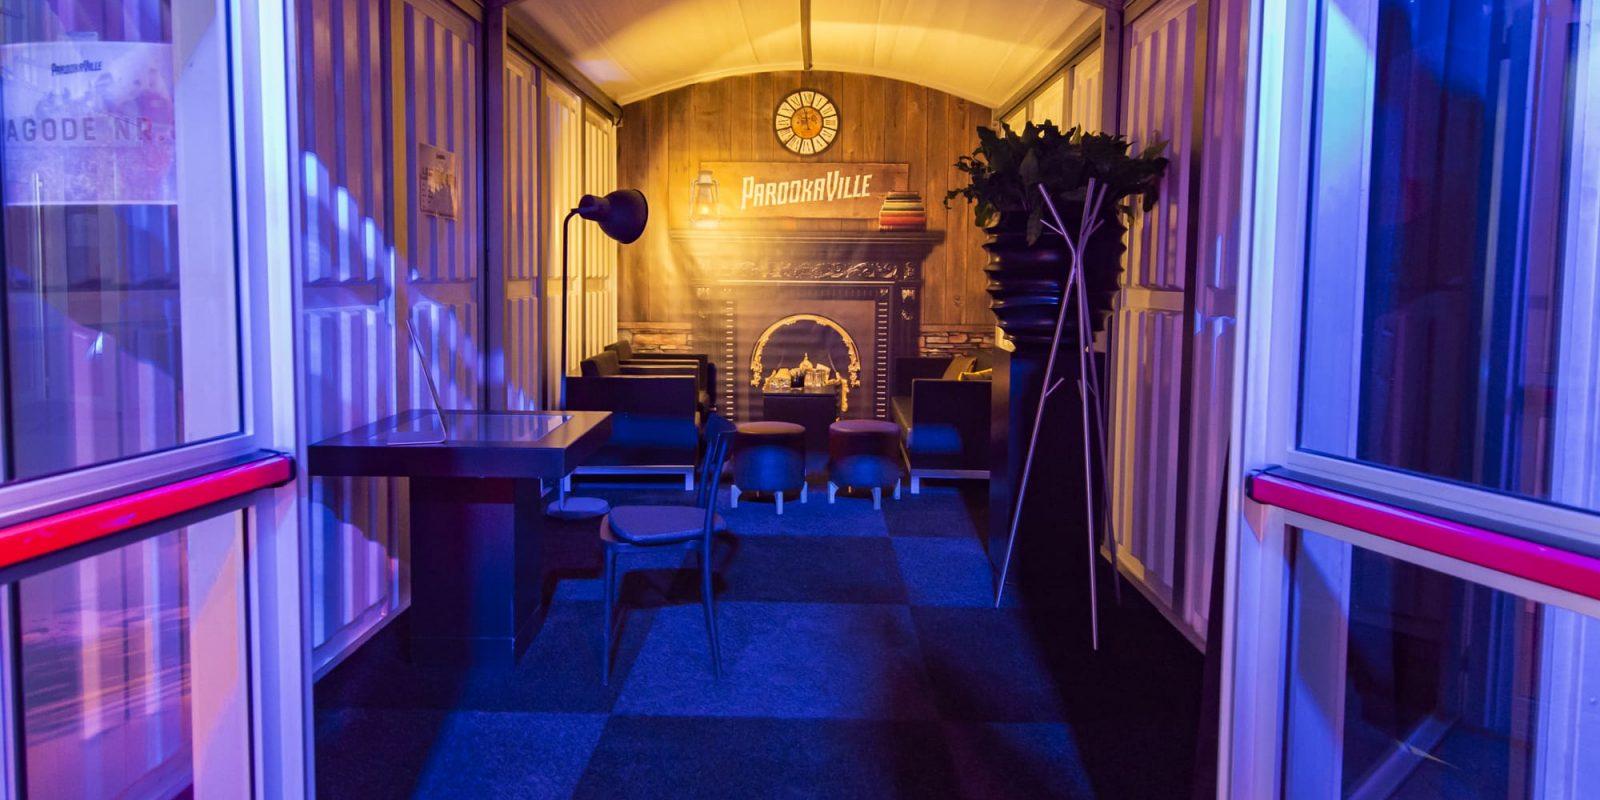 Bas de Boer - Eventstyling Parookaville Festival 2019 : Backstage : Künstlergarderoben : Loungemöbel : ArtistVillage : Backstagebereich : www.basdeboer-eventstyling.de - 098